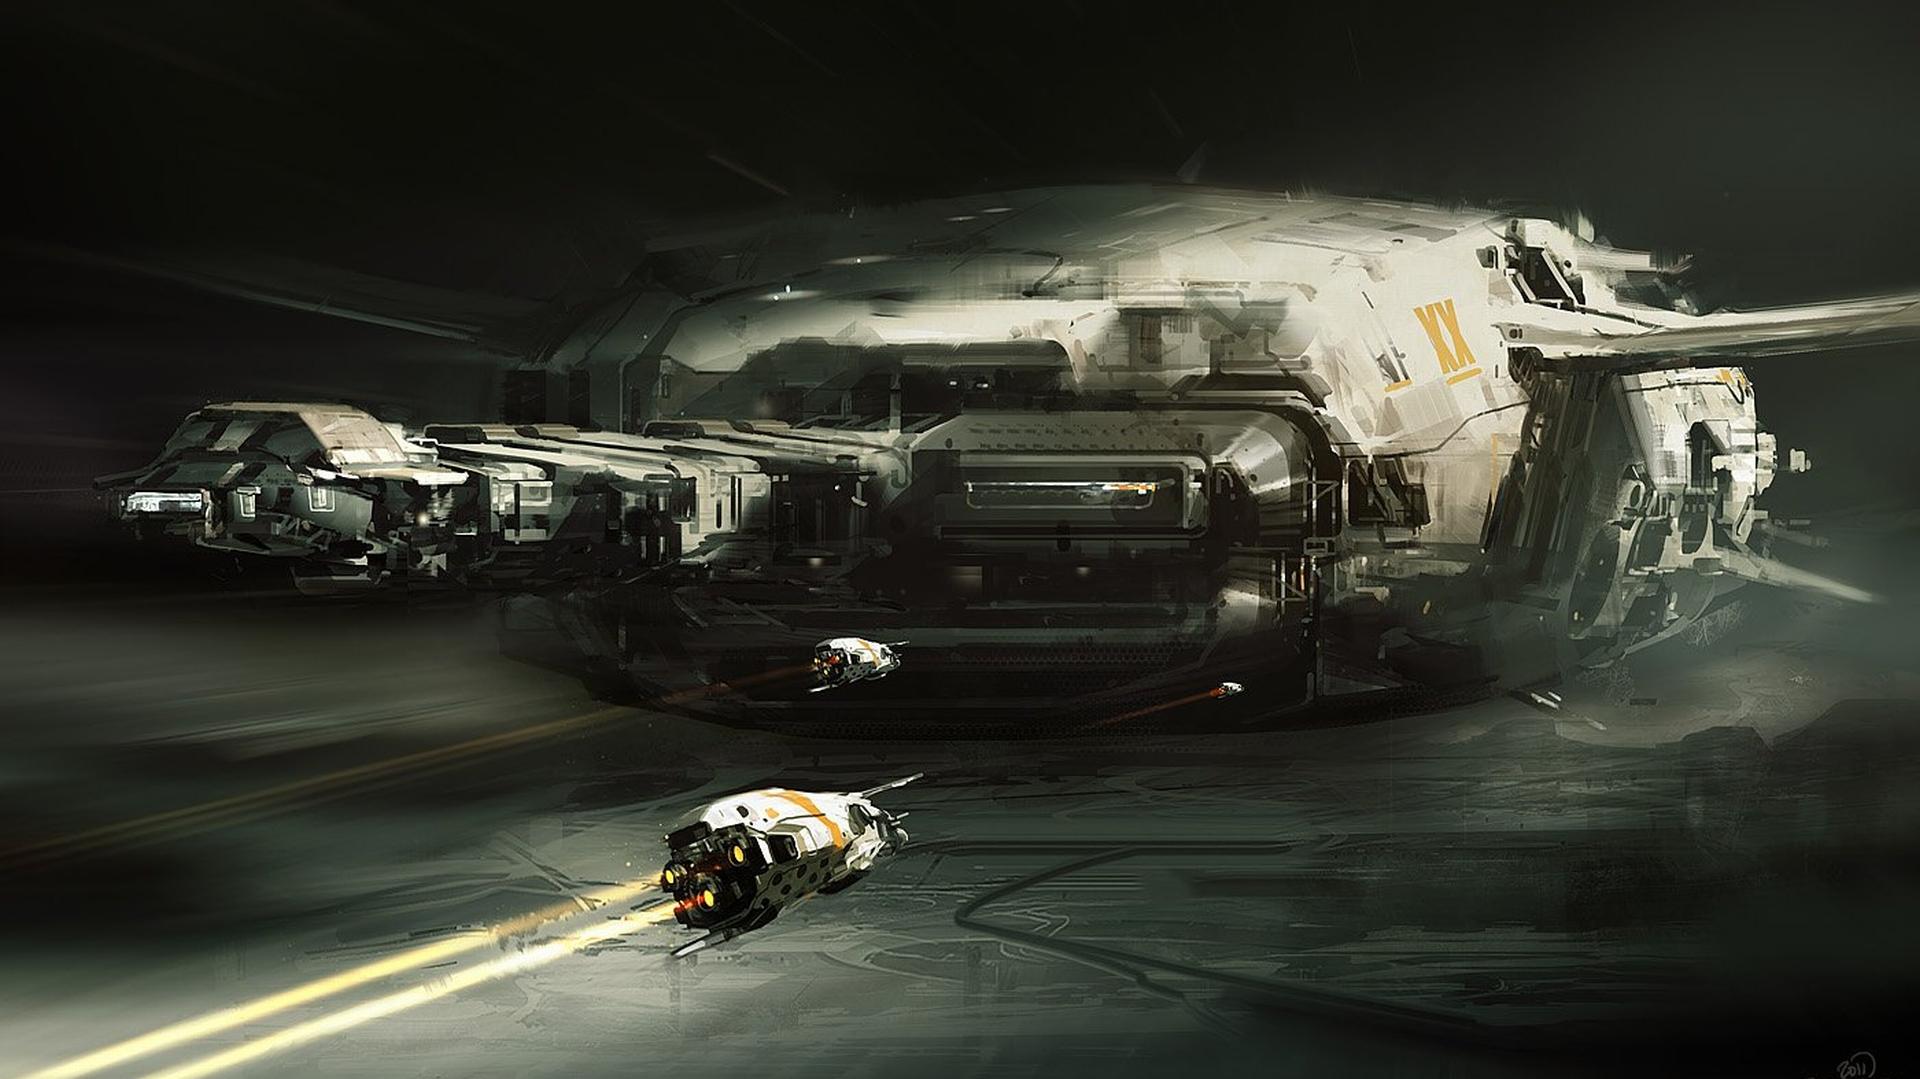 spaceship wallpaper 1920x1080